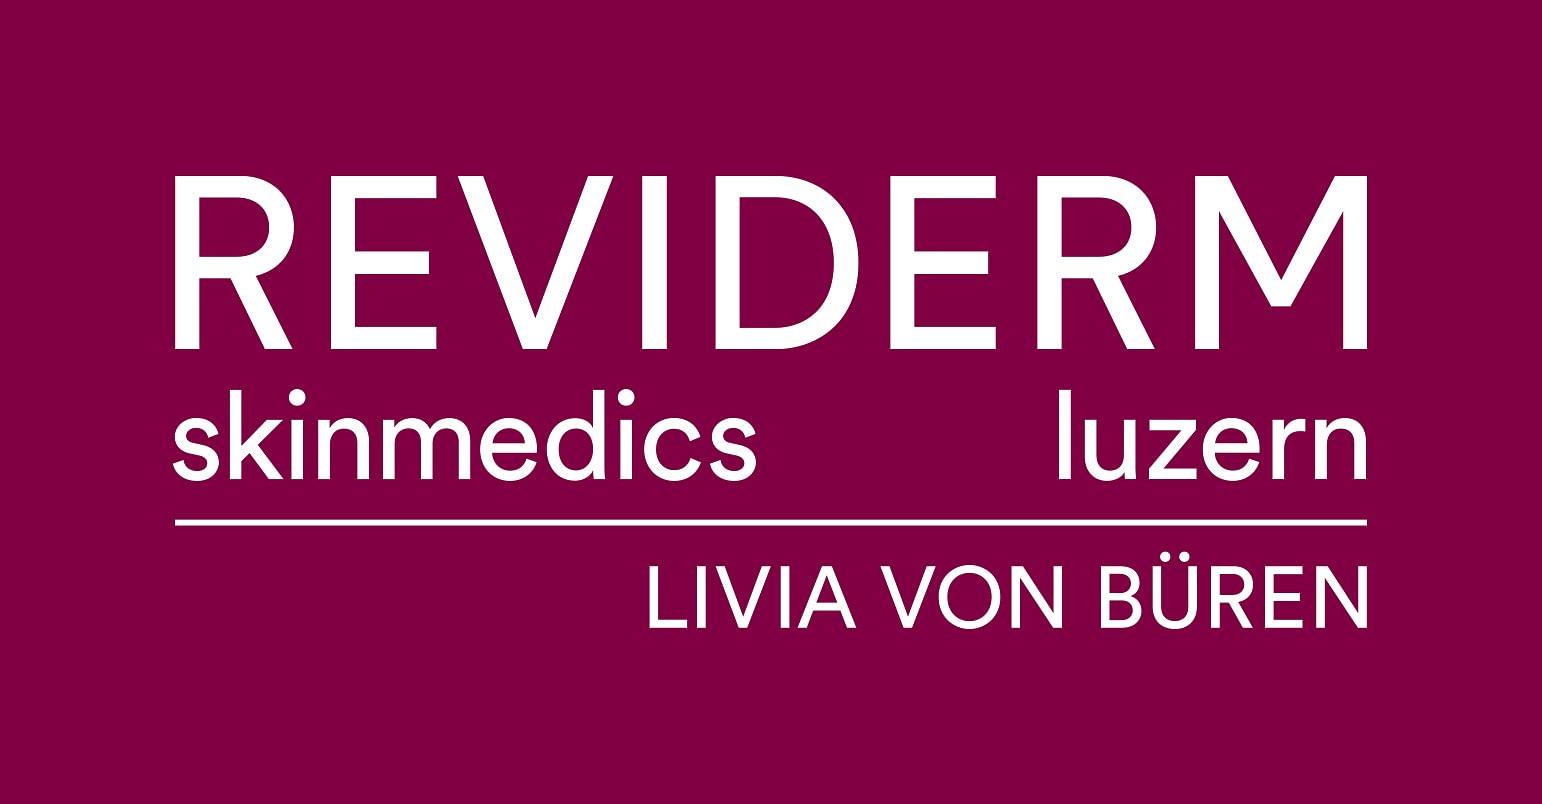 Reviderm skinmedics luzern